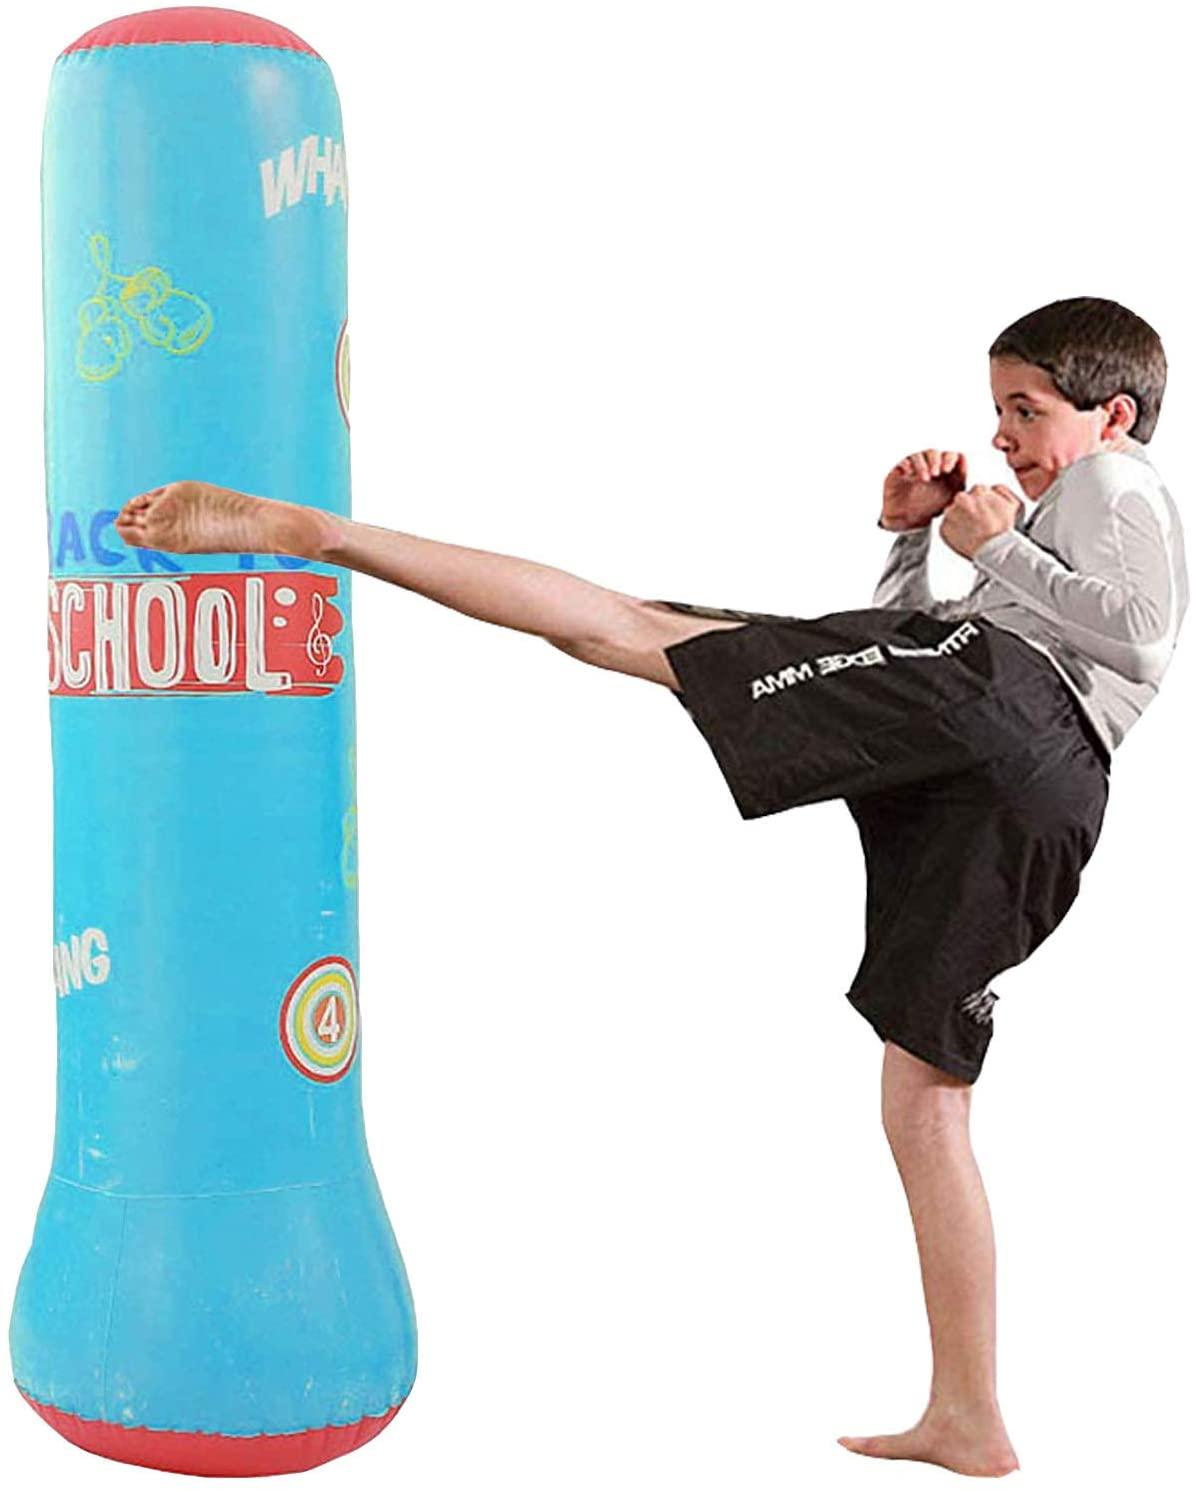 MrsharkFit Inflatable Punching Bag